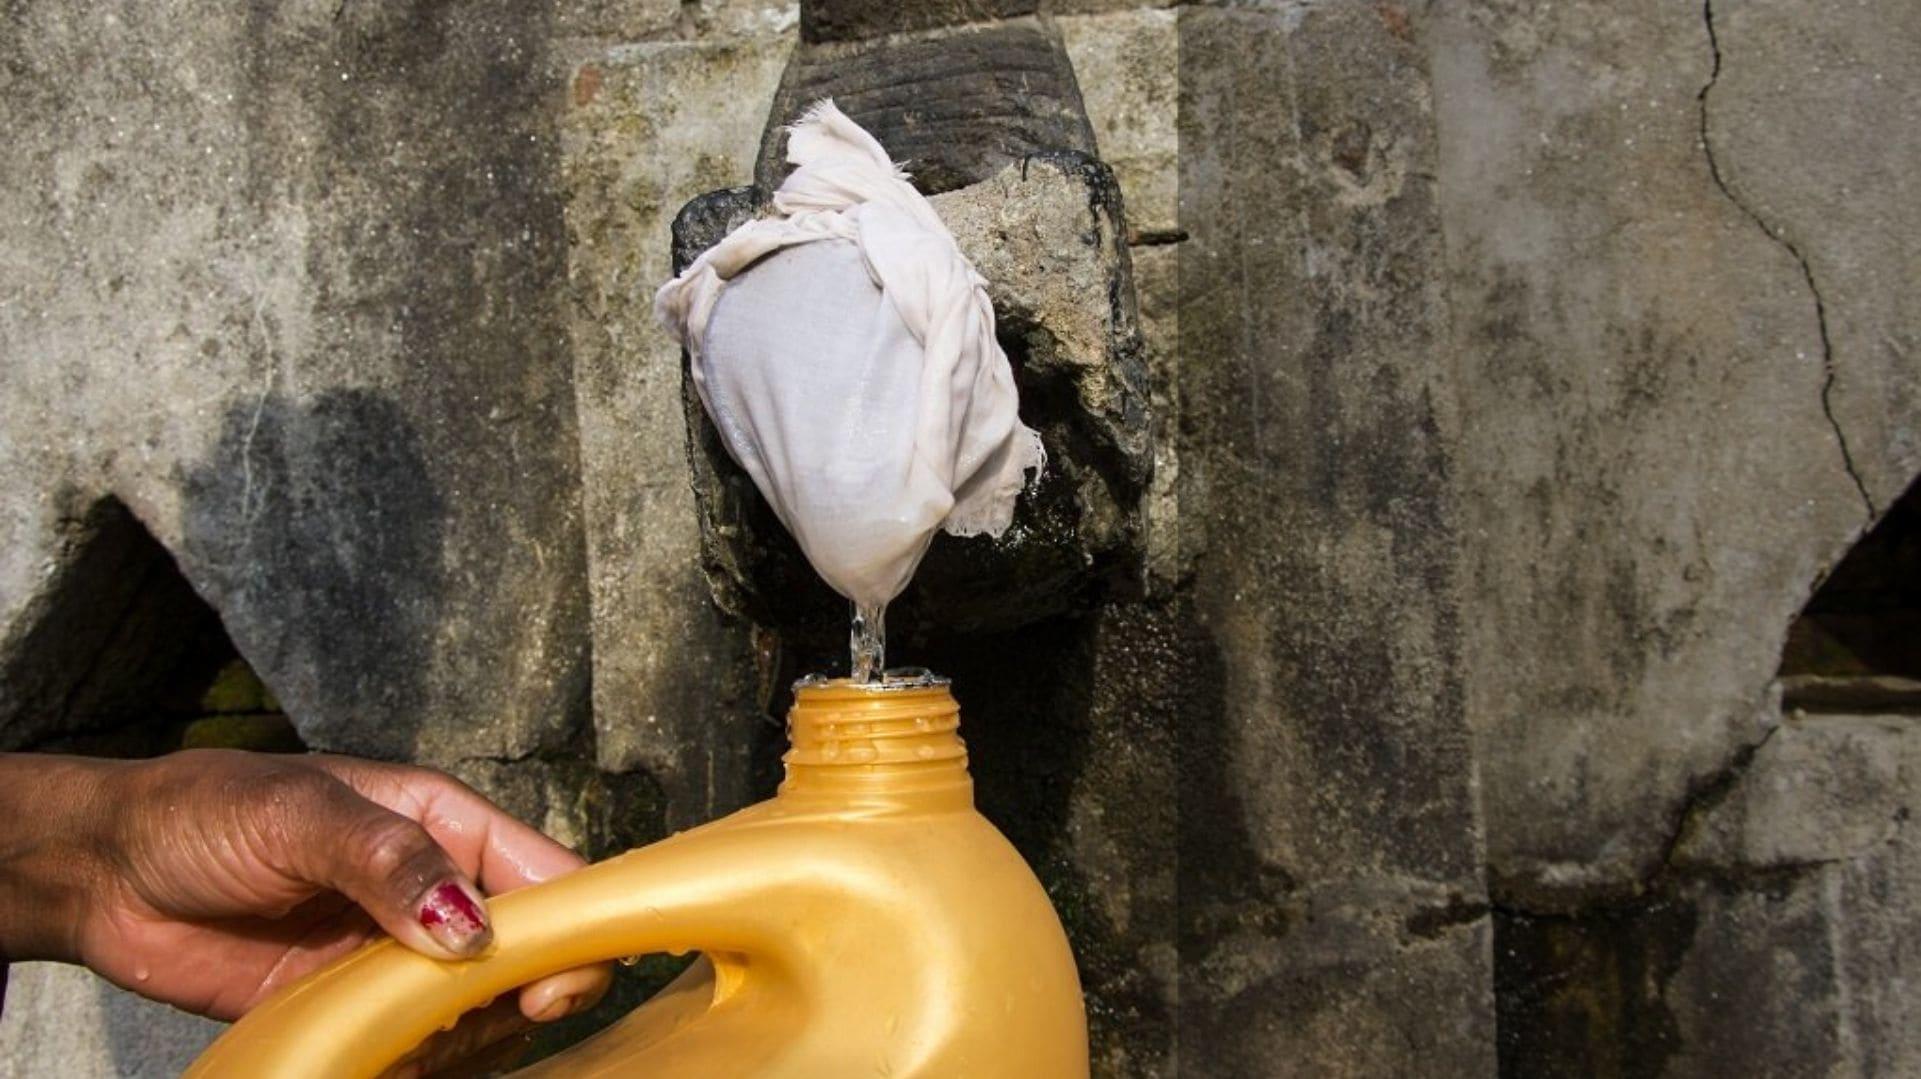 Coronavirus Outbreak: In Kathmandu, ancient stone water spouts offer solace during lockdown